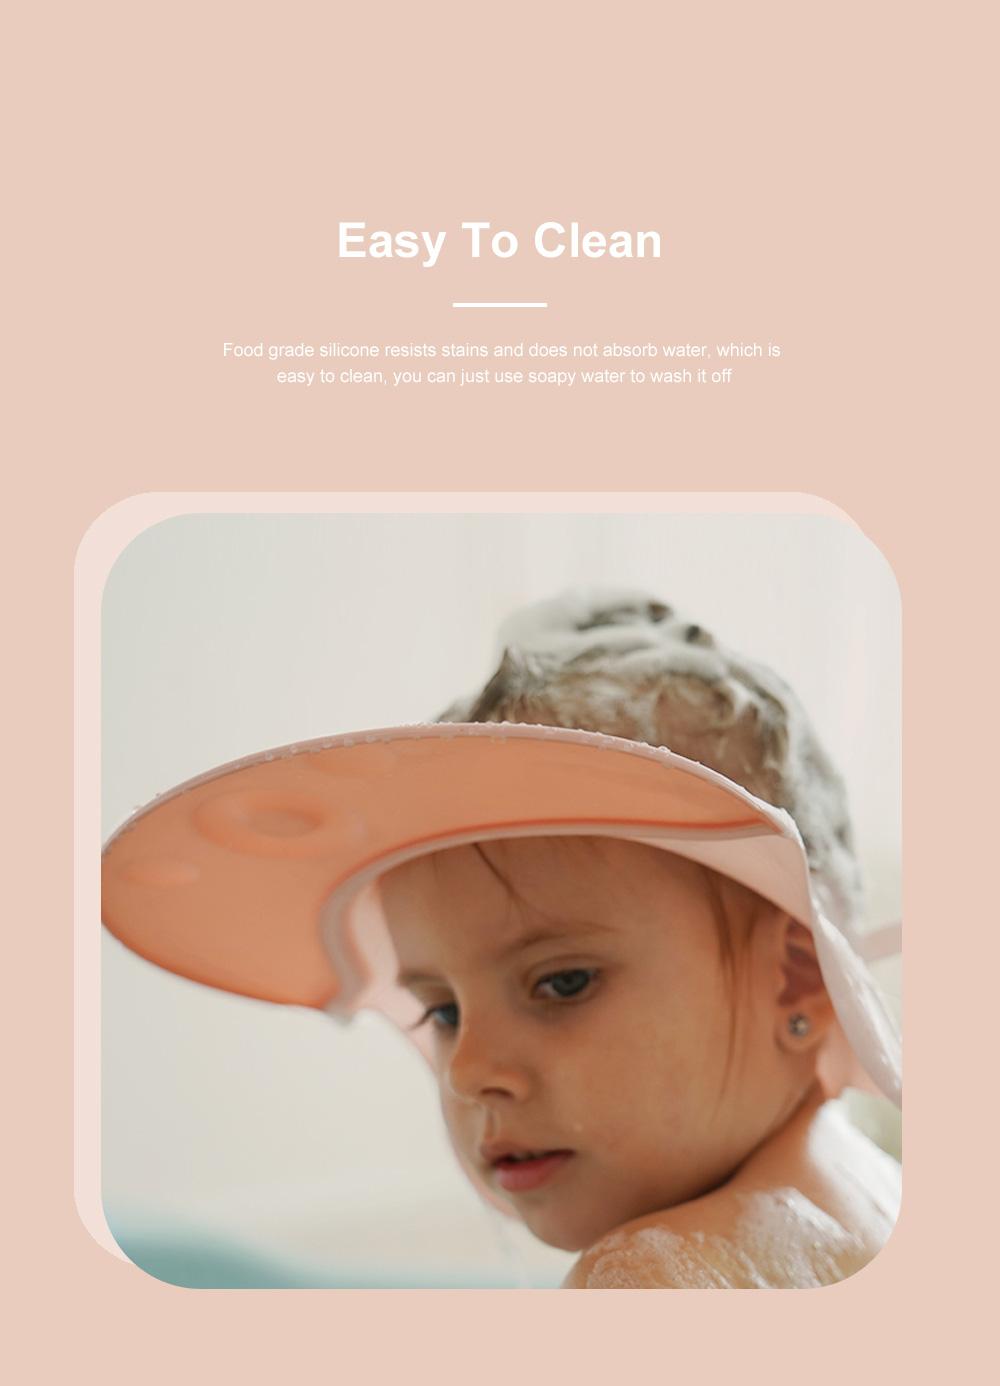 Baby Bathing Cap Shampoo Visor Bathroom Safety Caps with Adjustable Sticker Waterproof & Elastic Octopus Shampoo Hat for Showers, Bathing 4